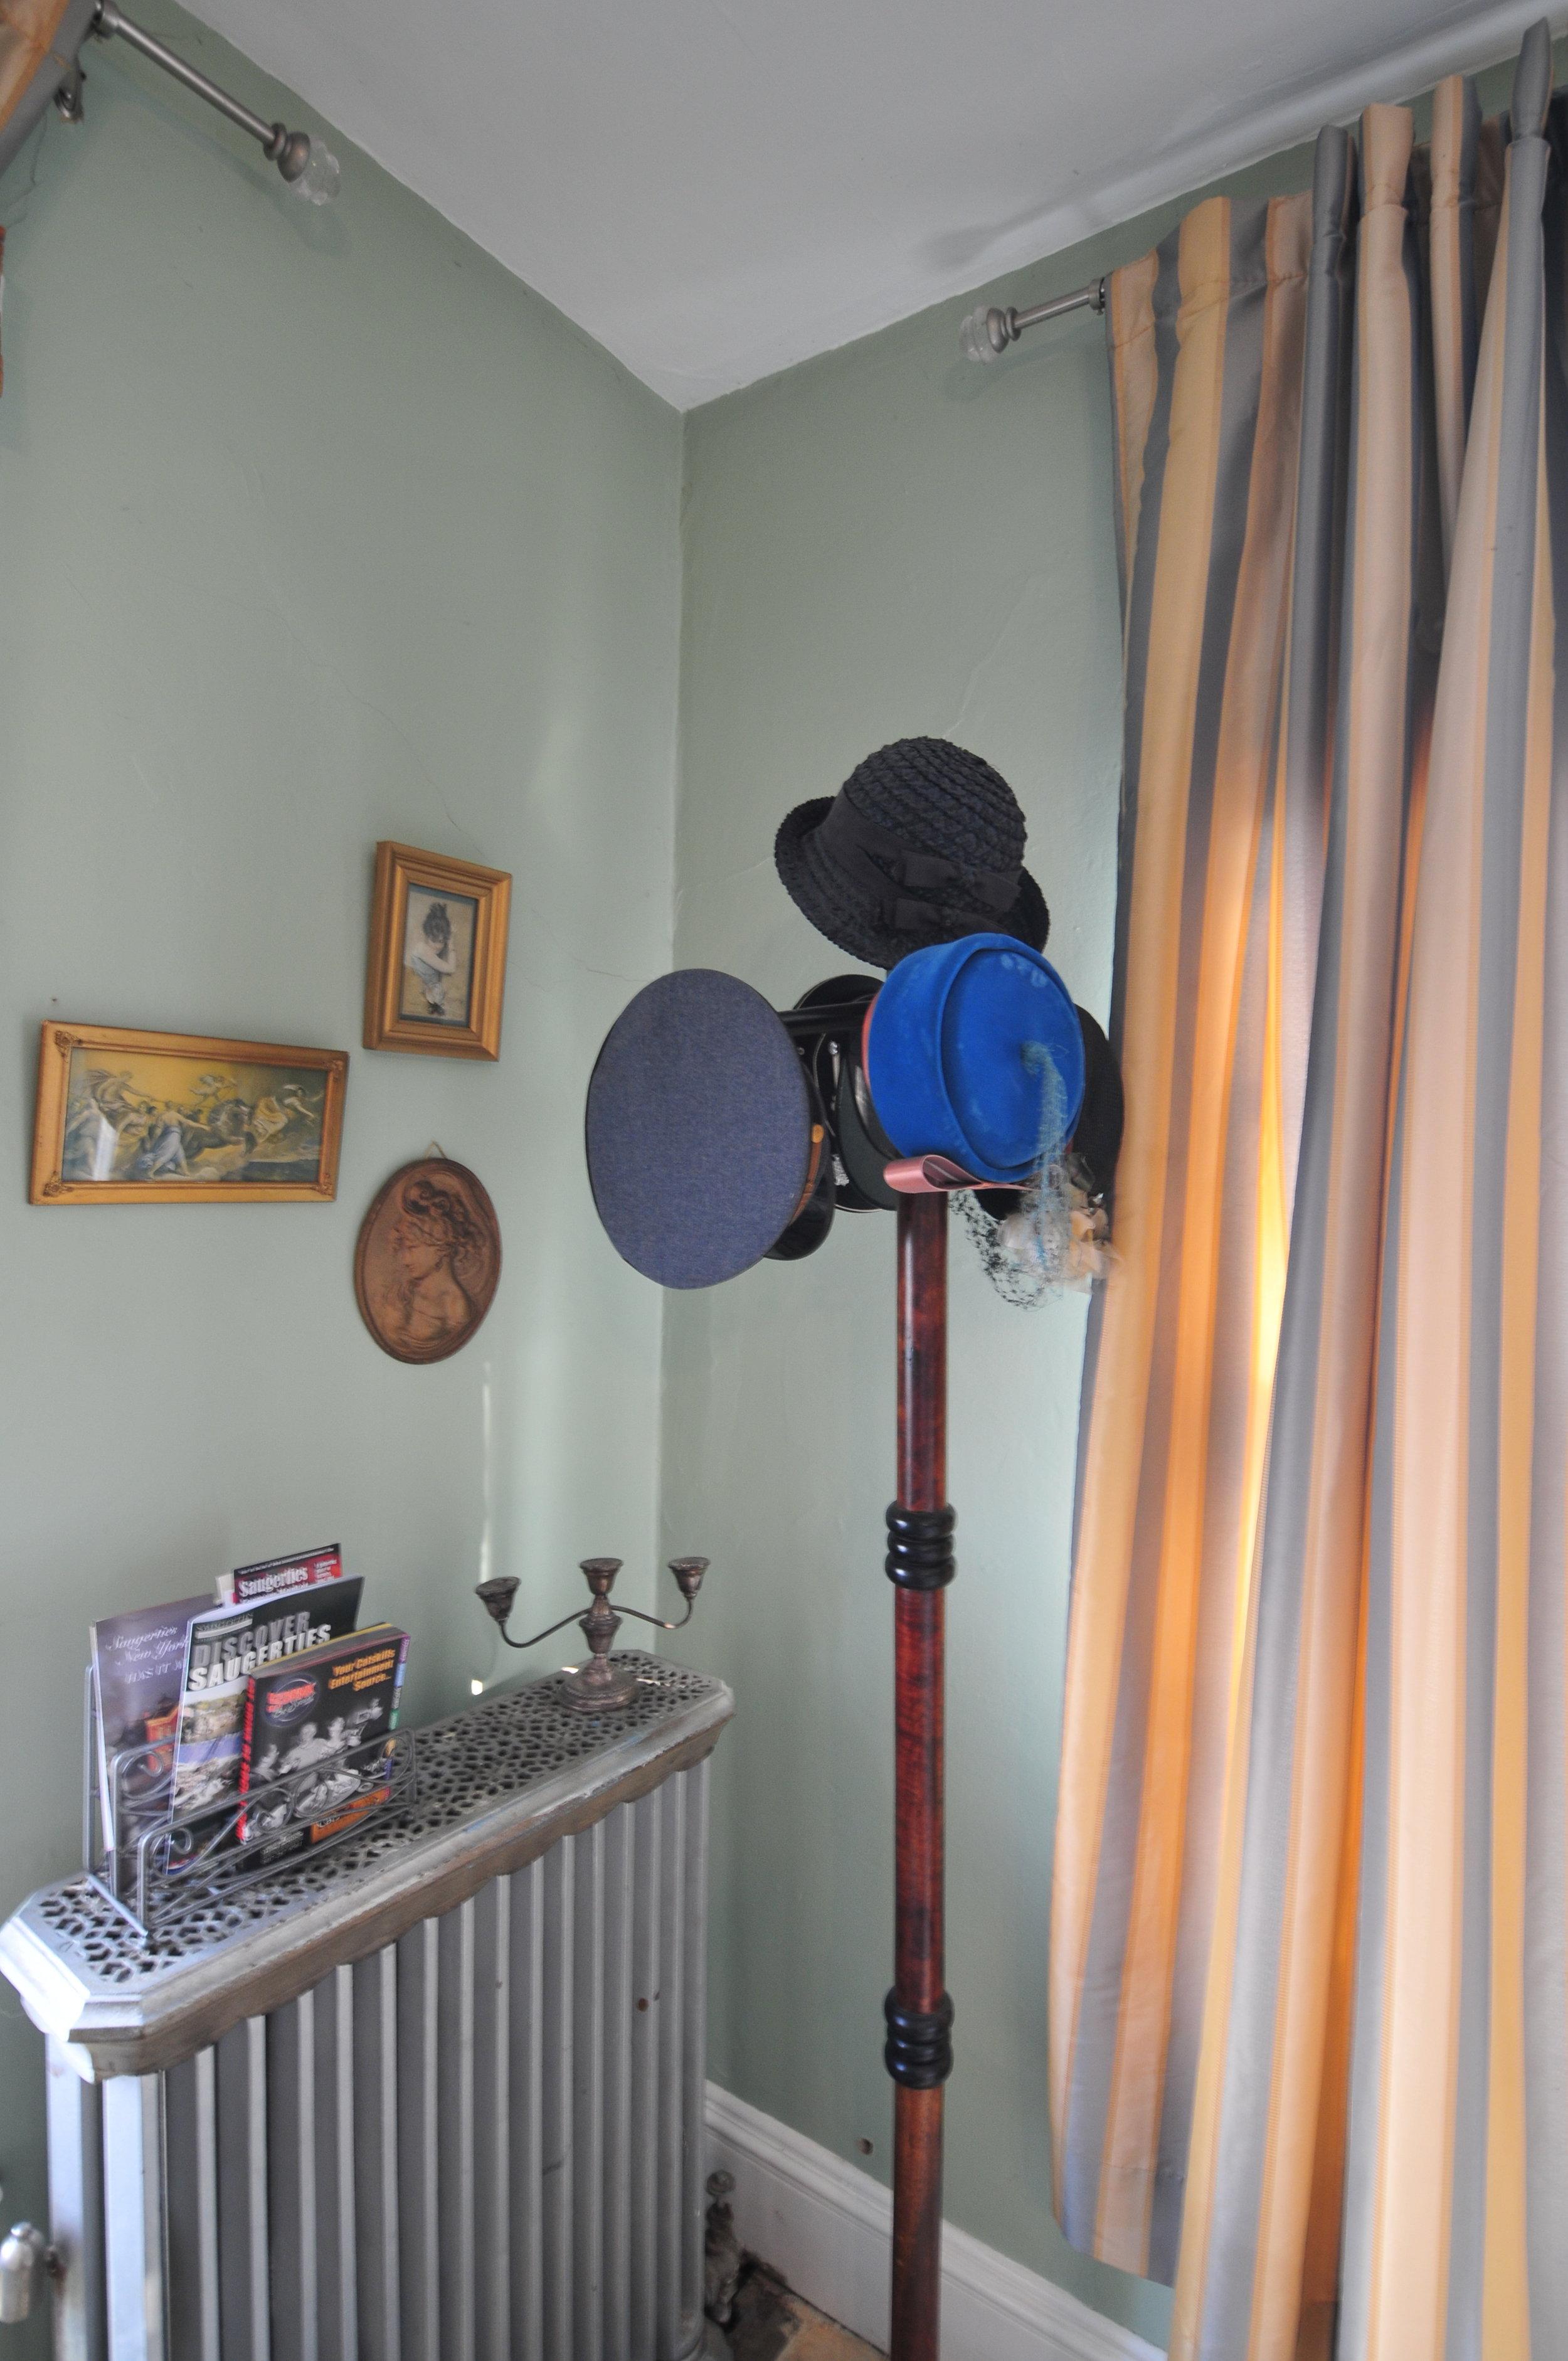 Bohemian Inn's Athens Room